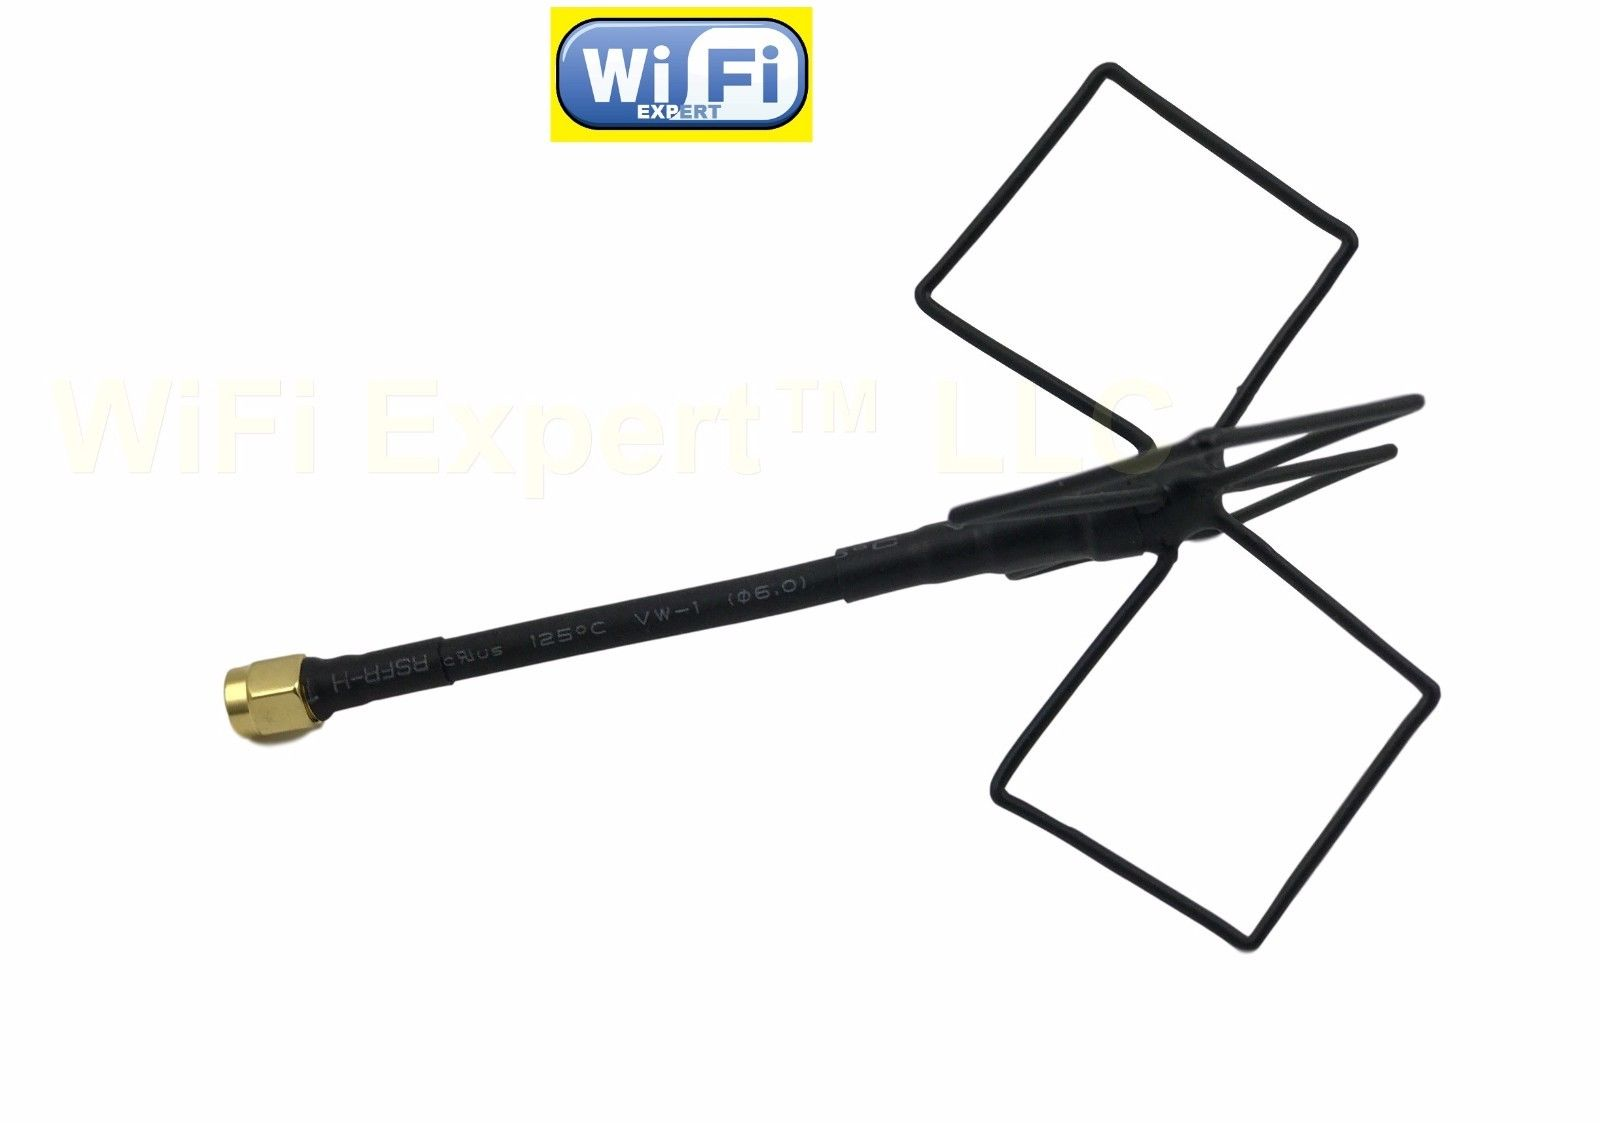 Rp Sma Wifi Antenna 2 4ghz Omni Biquad Mach 4b Antenna For